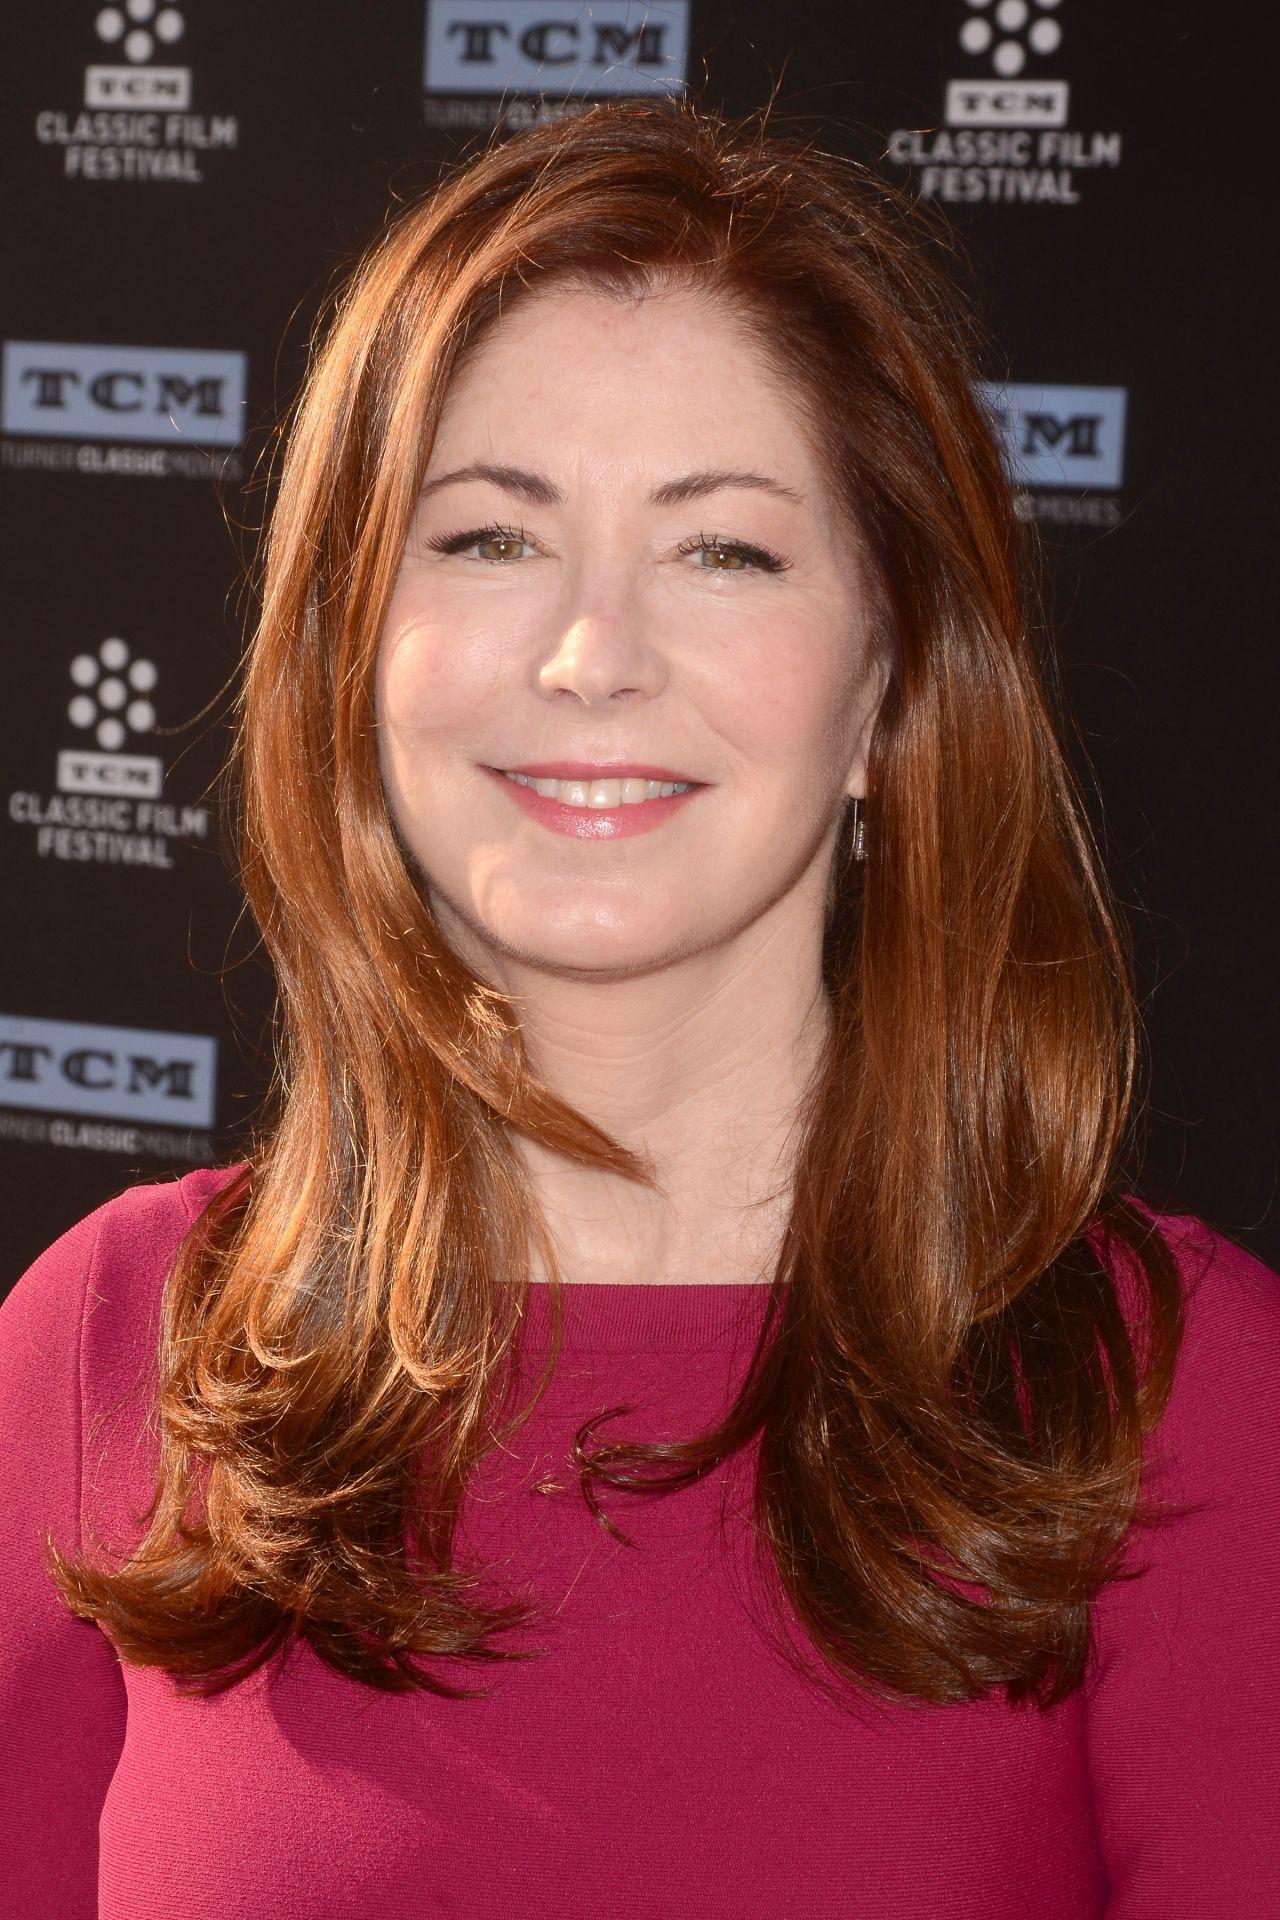 Dana Delany Tcm Classic Film Festival Opening Night In